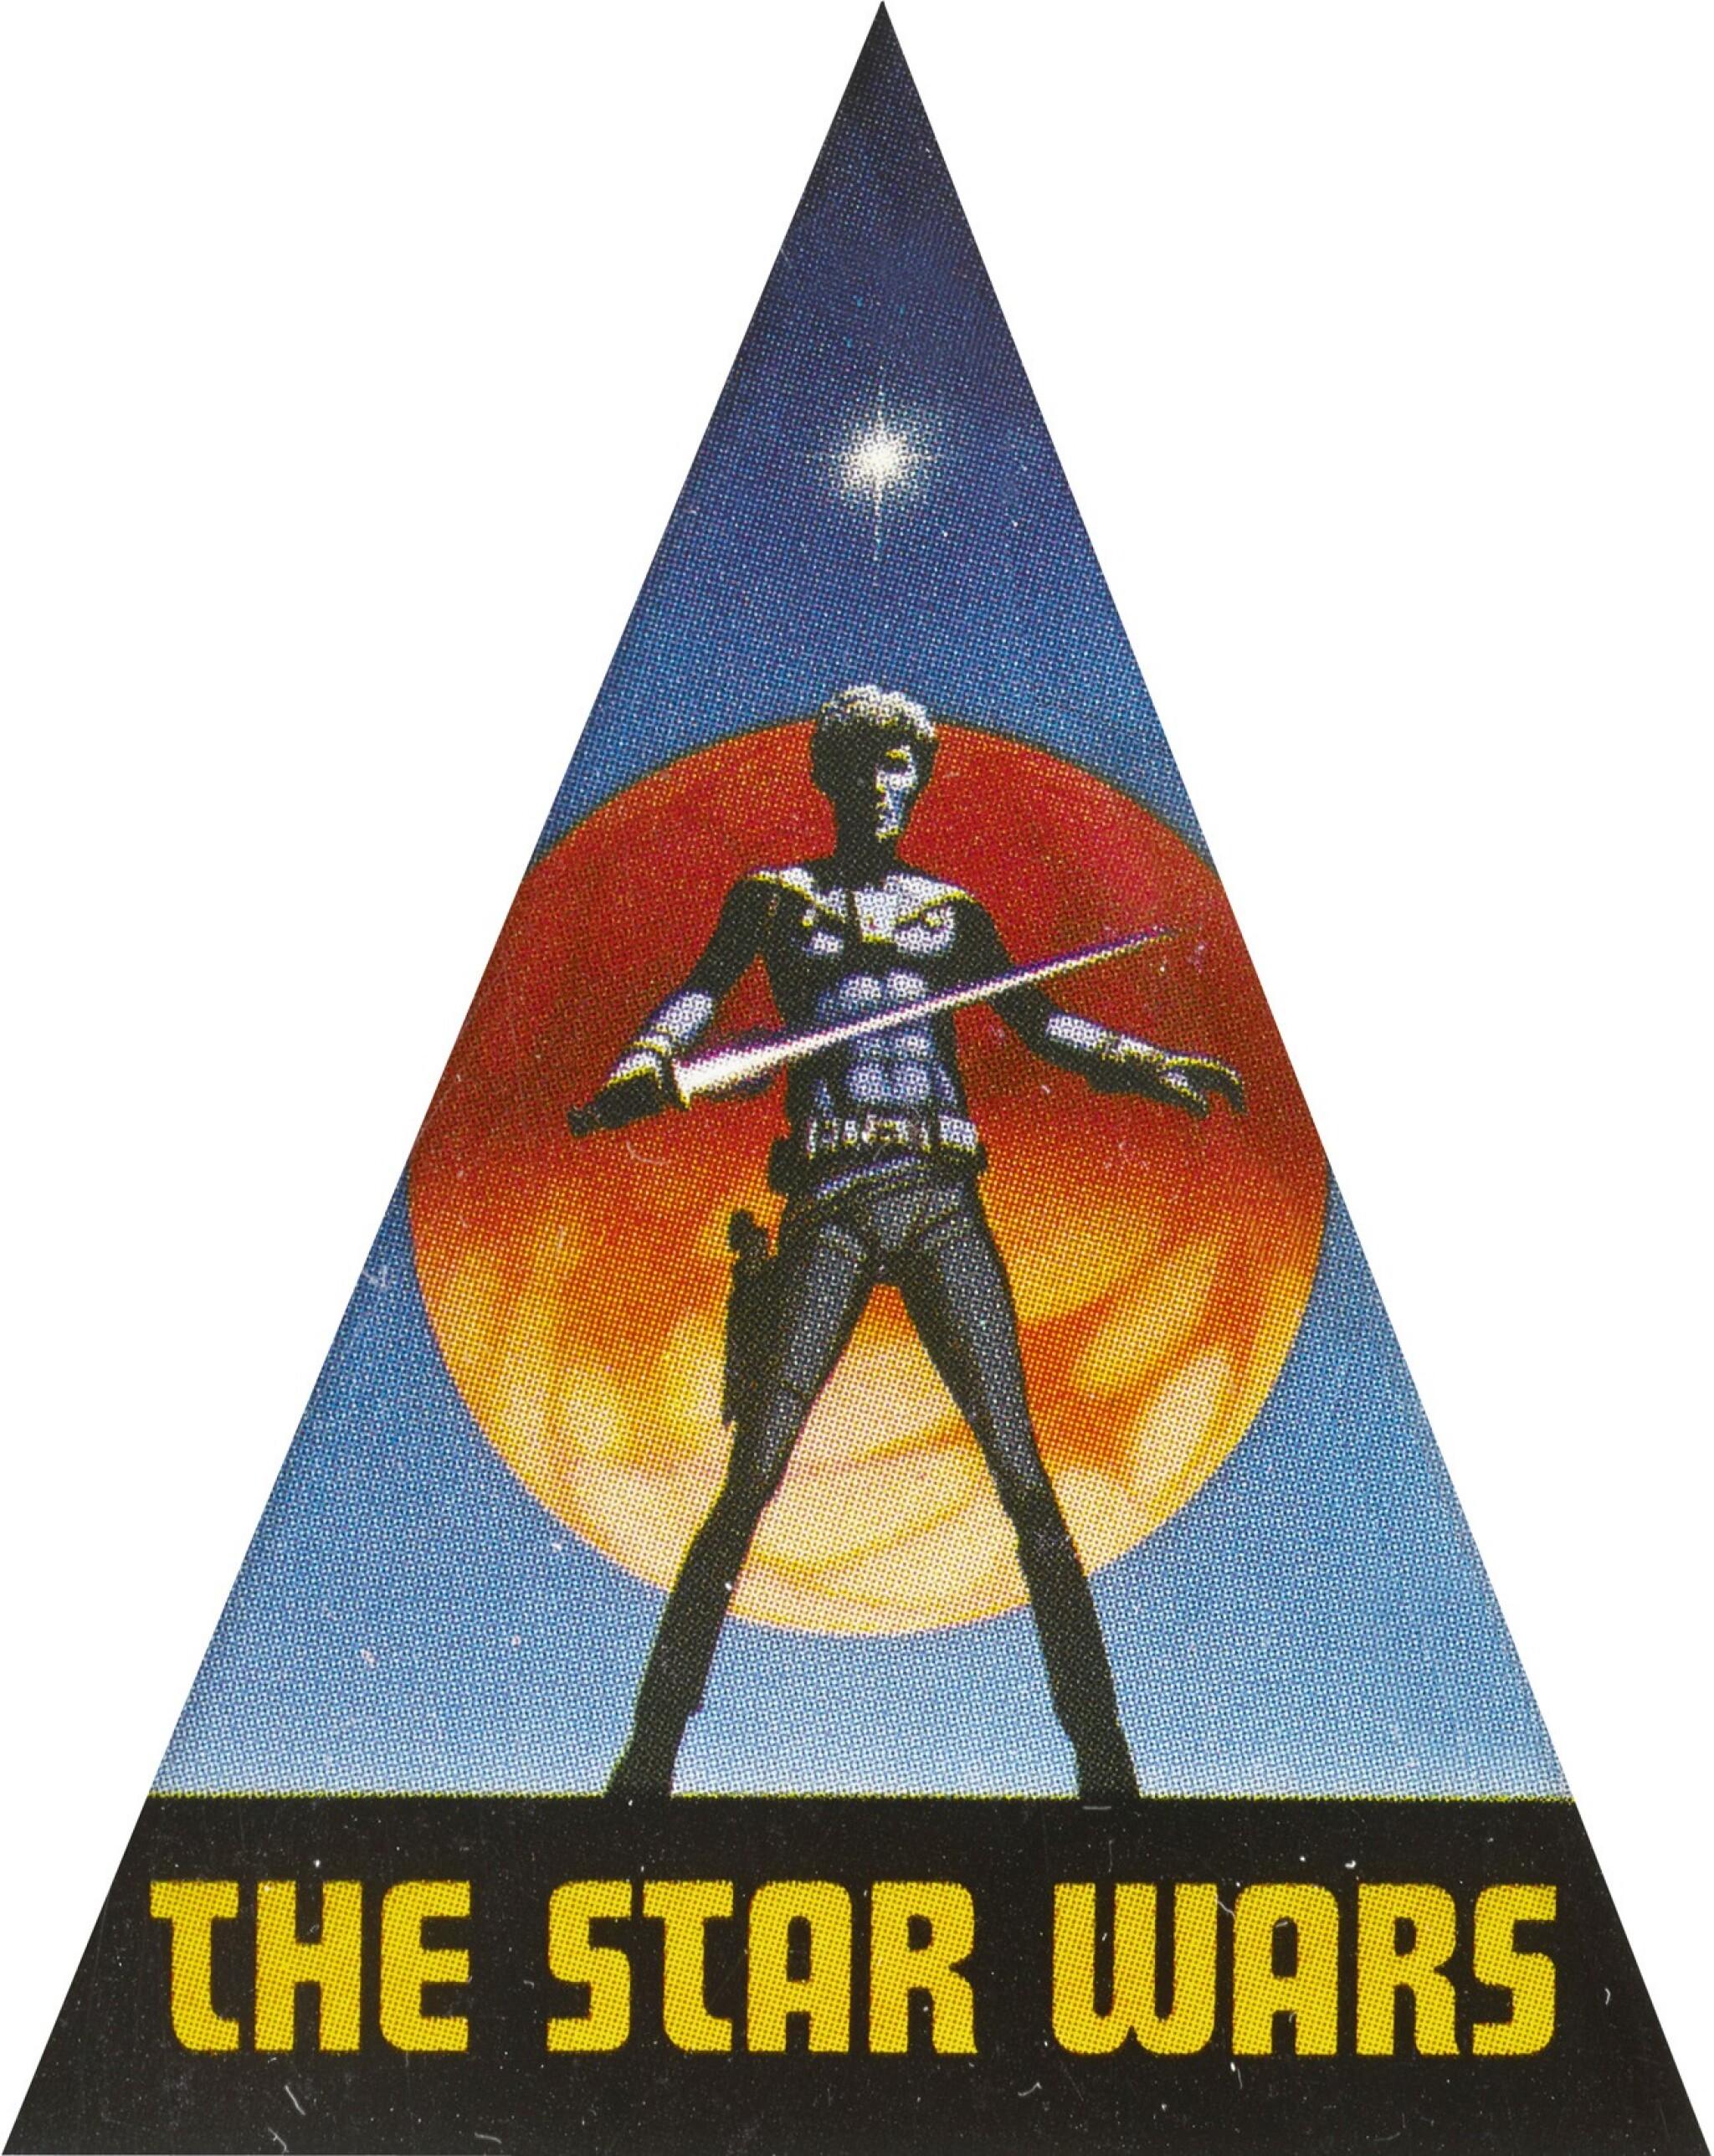 STAR WARS, ADVANCE UNUSED STICKER (DECAL), RALPH MCQUARRIE, 1975